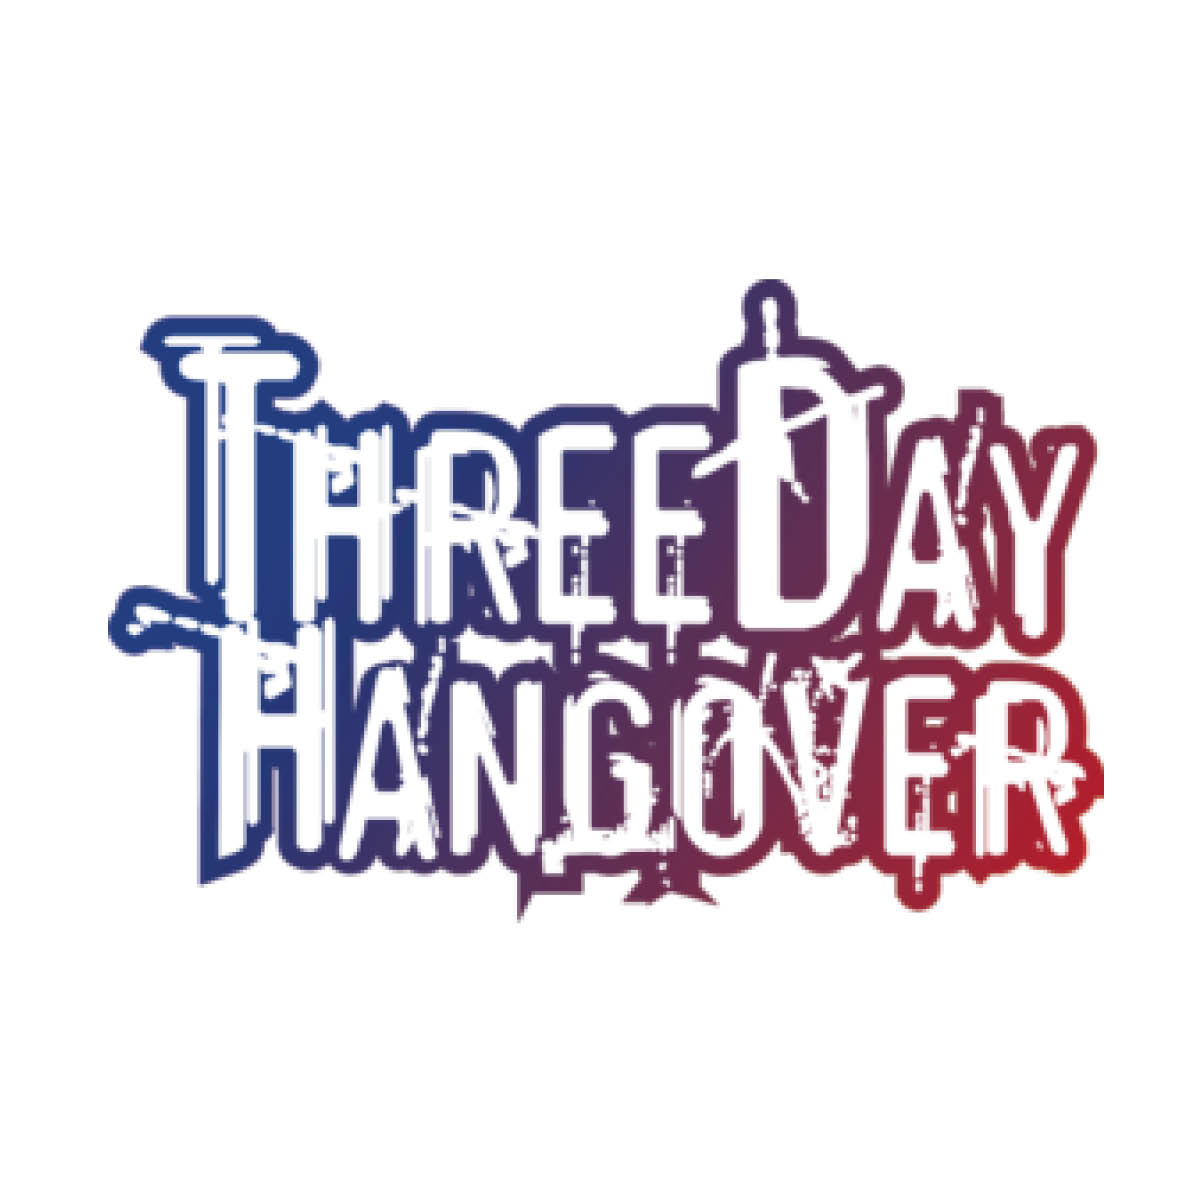 Three Day Hangover